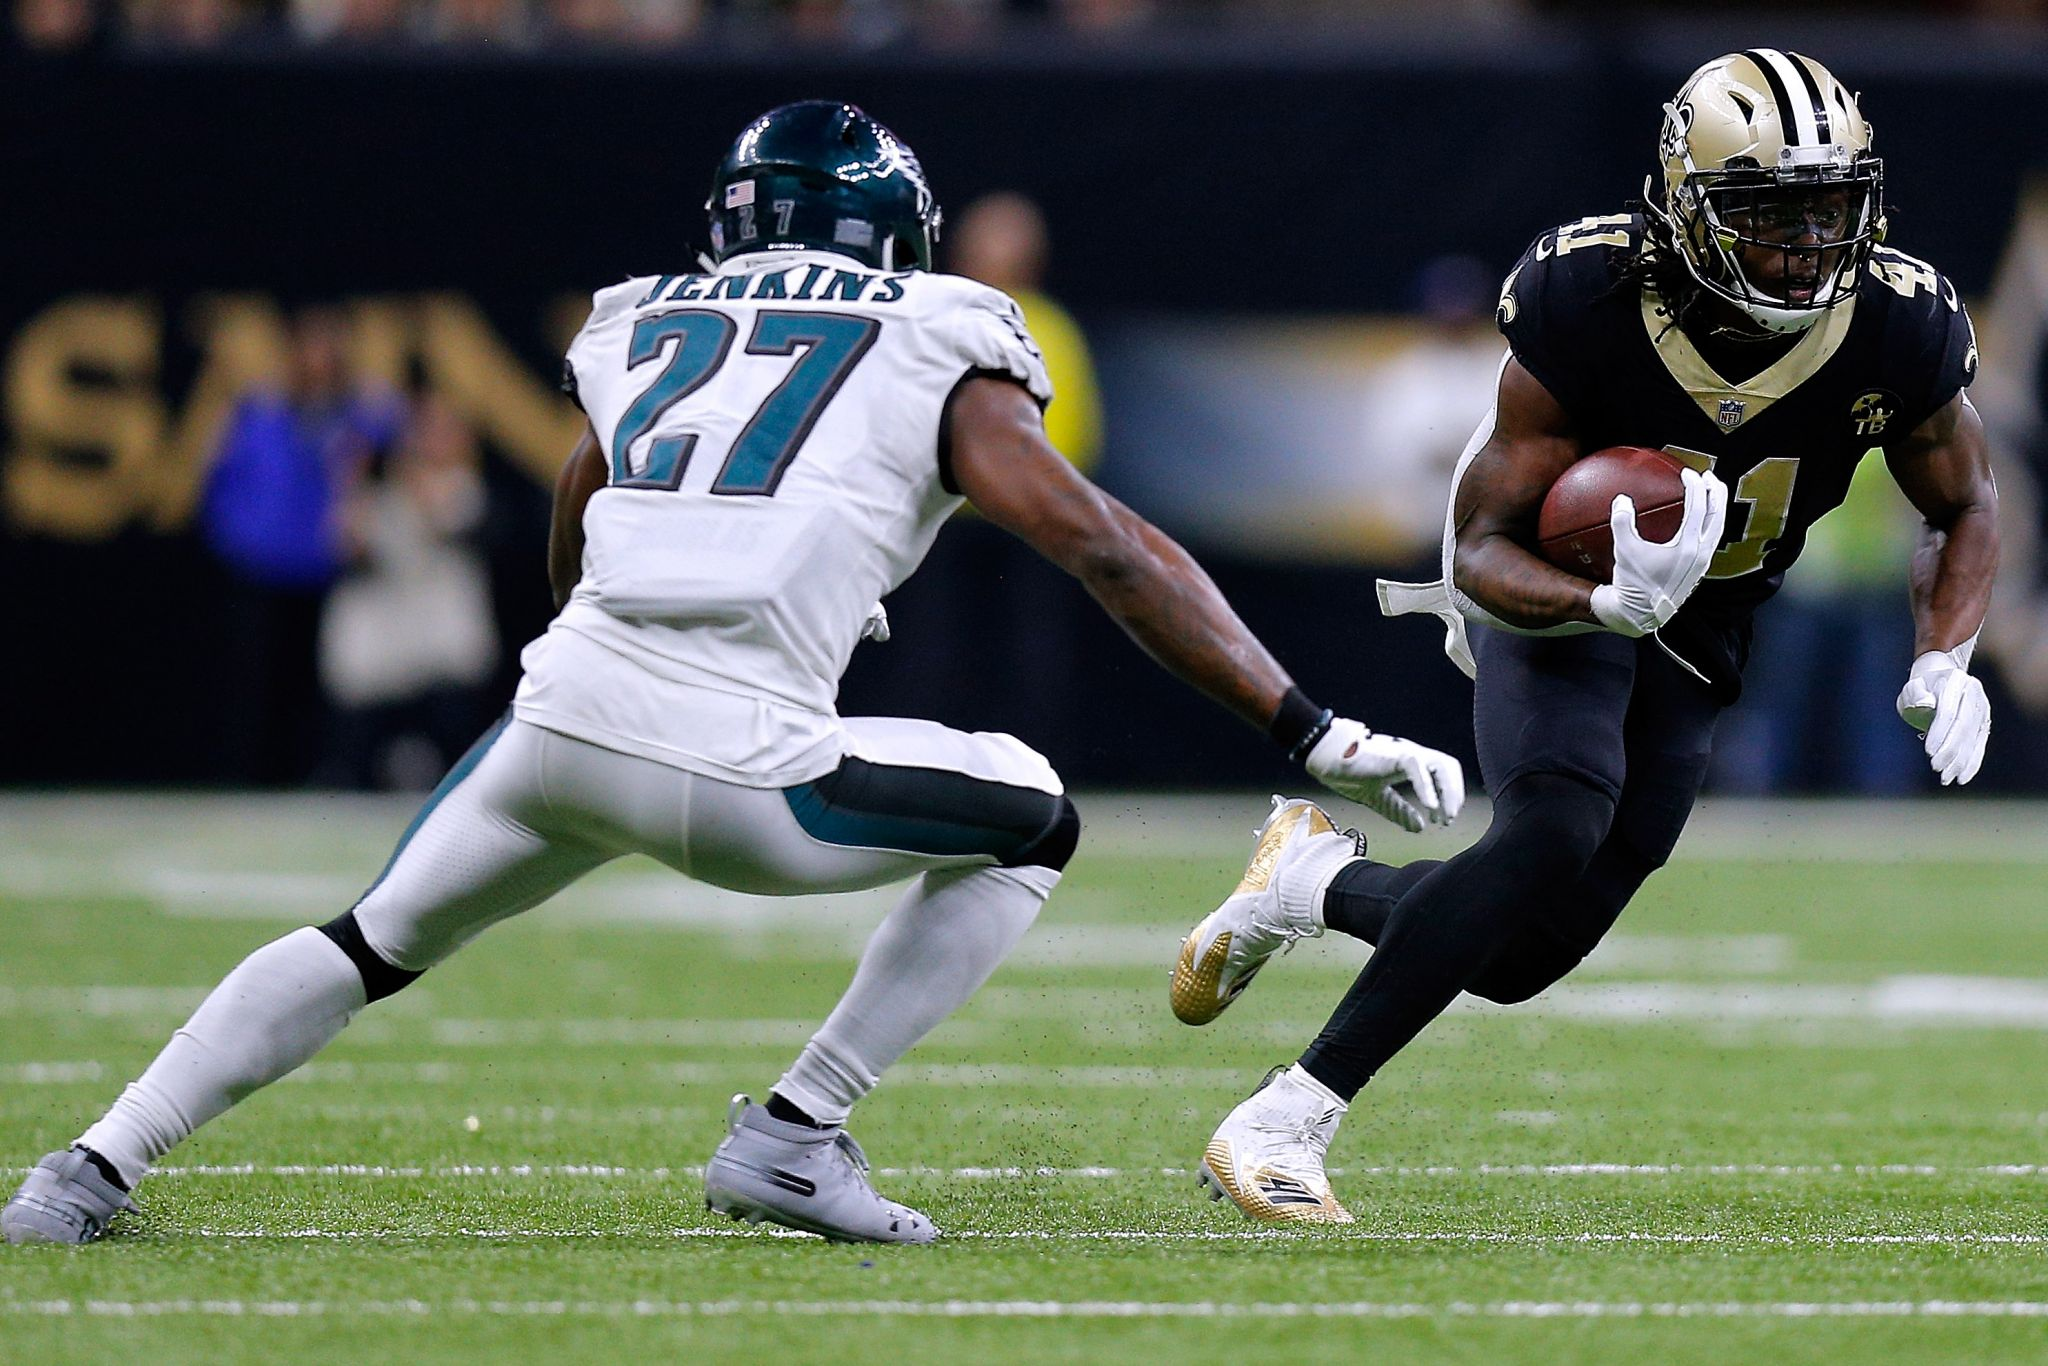 Saints' Alvin Kamara presents multidimensional threat to Texans' defense